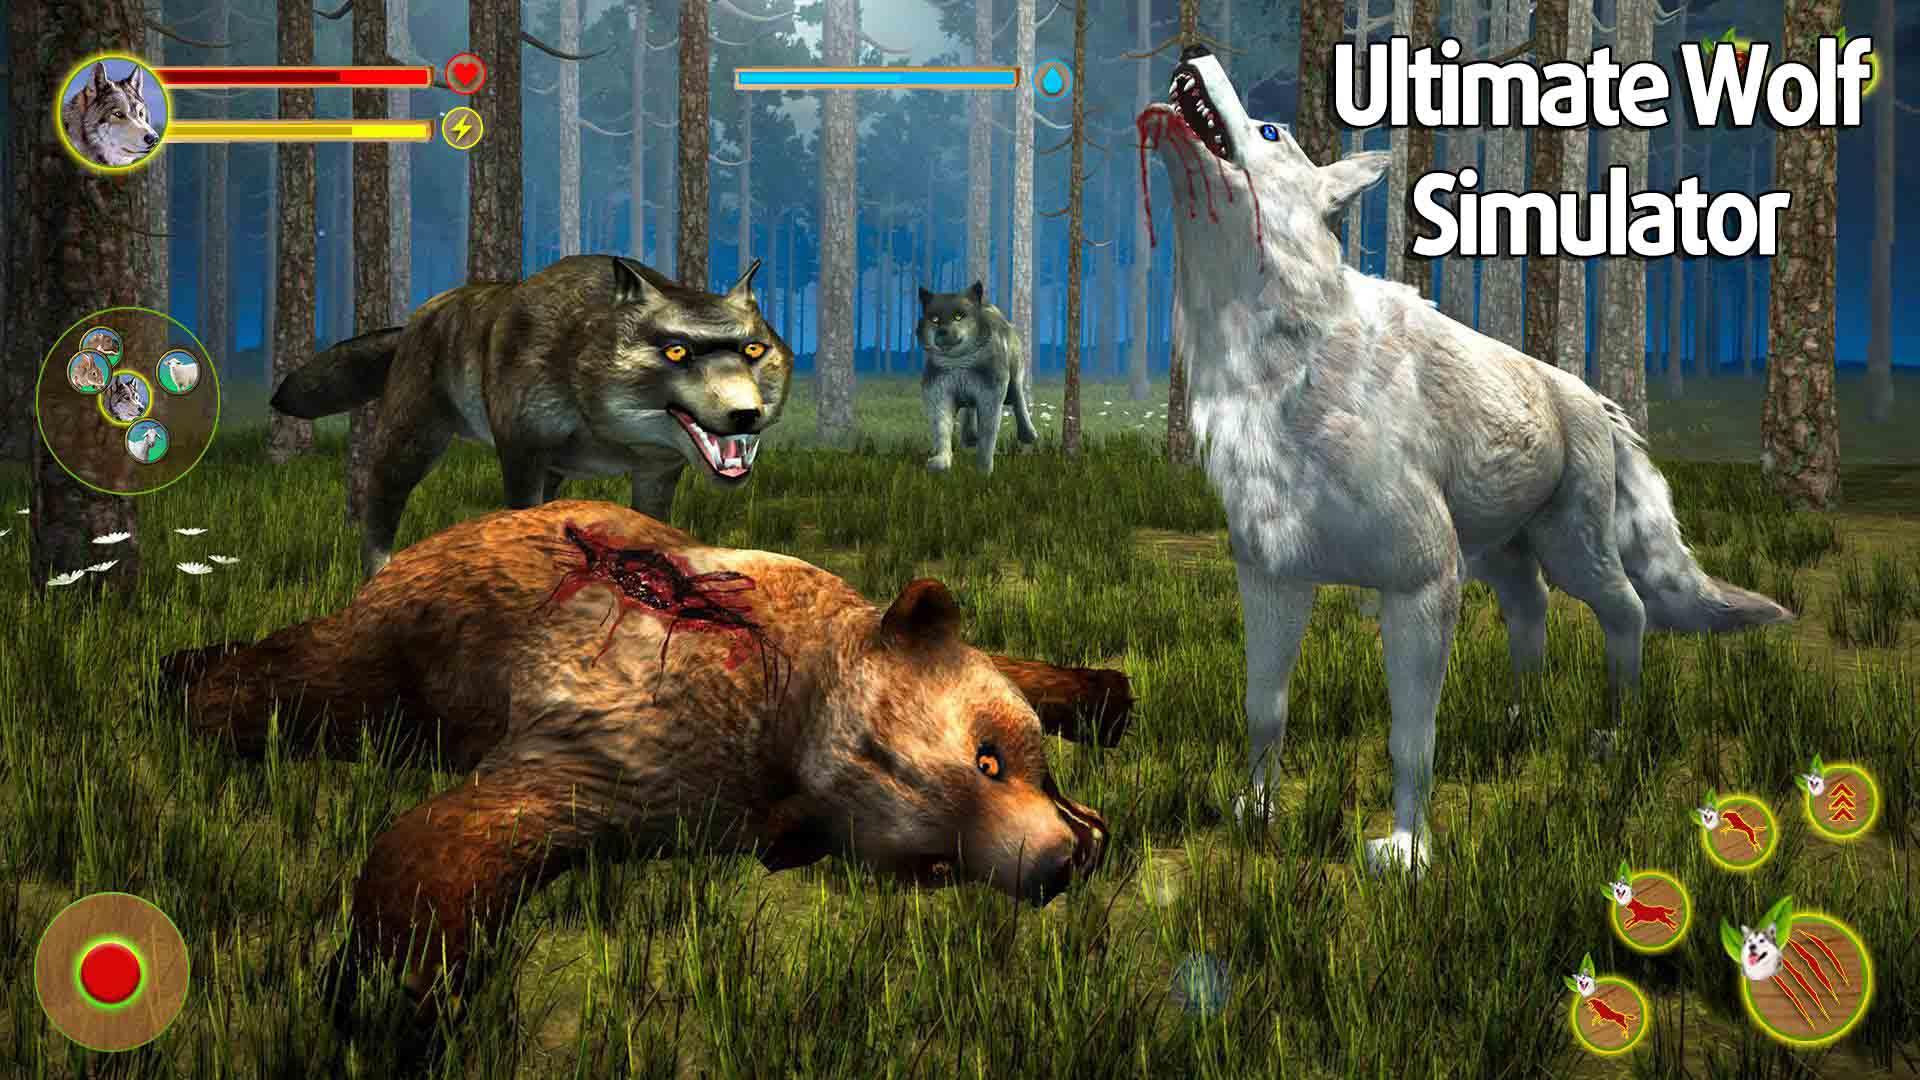 Ultimate Wolf Simulator poster